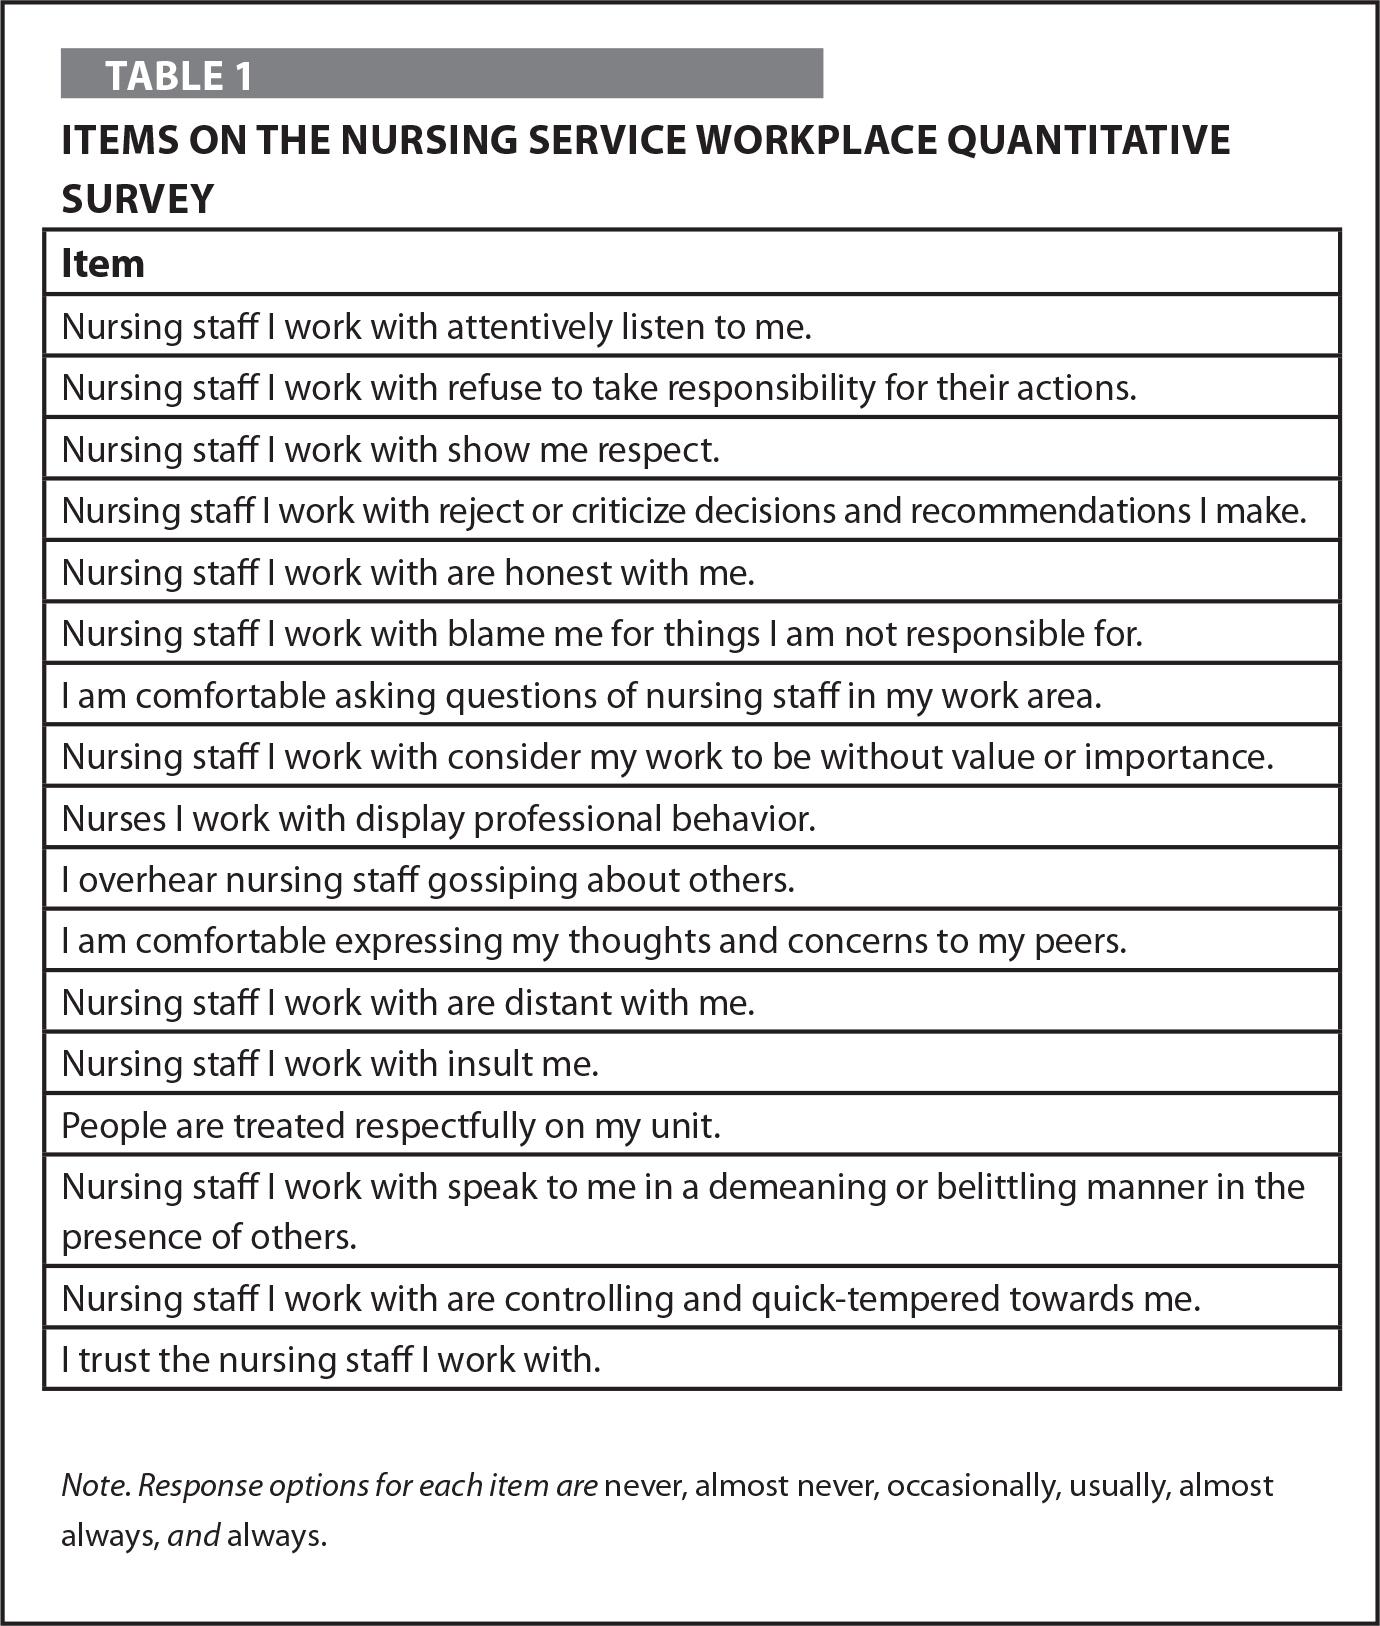 Items on the Nursing Service Workplace Quantitative Survey